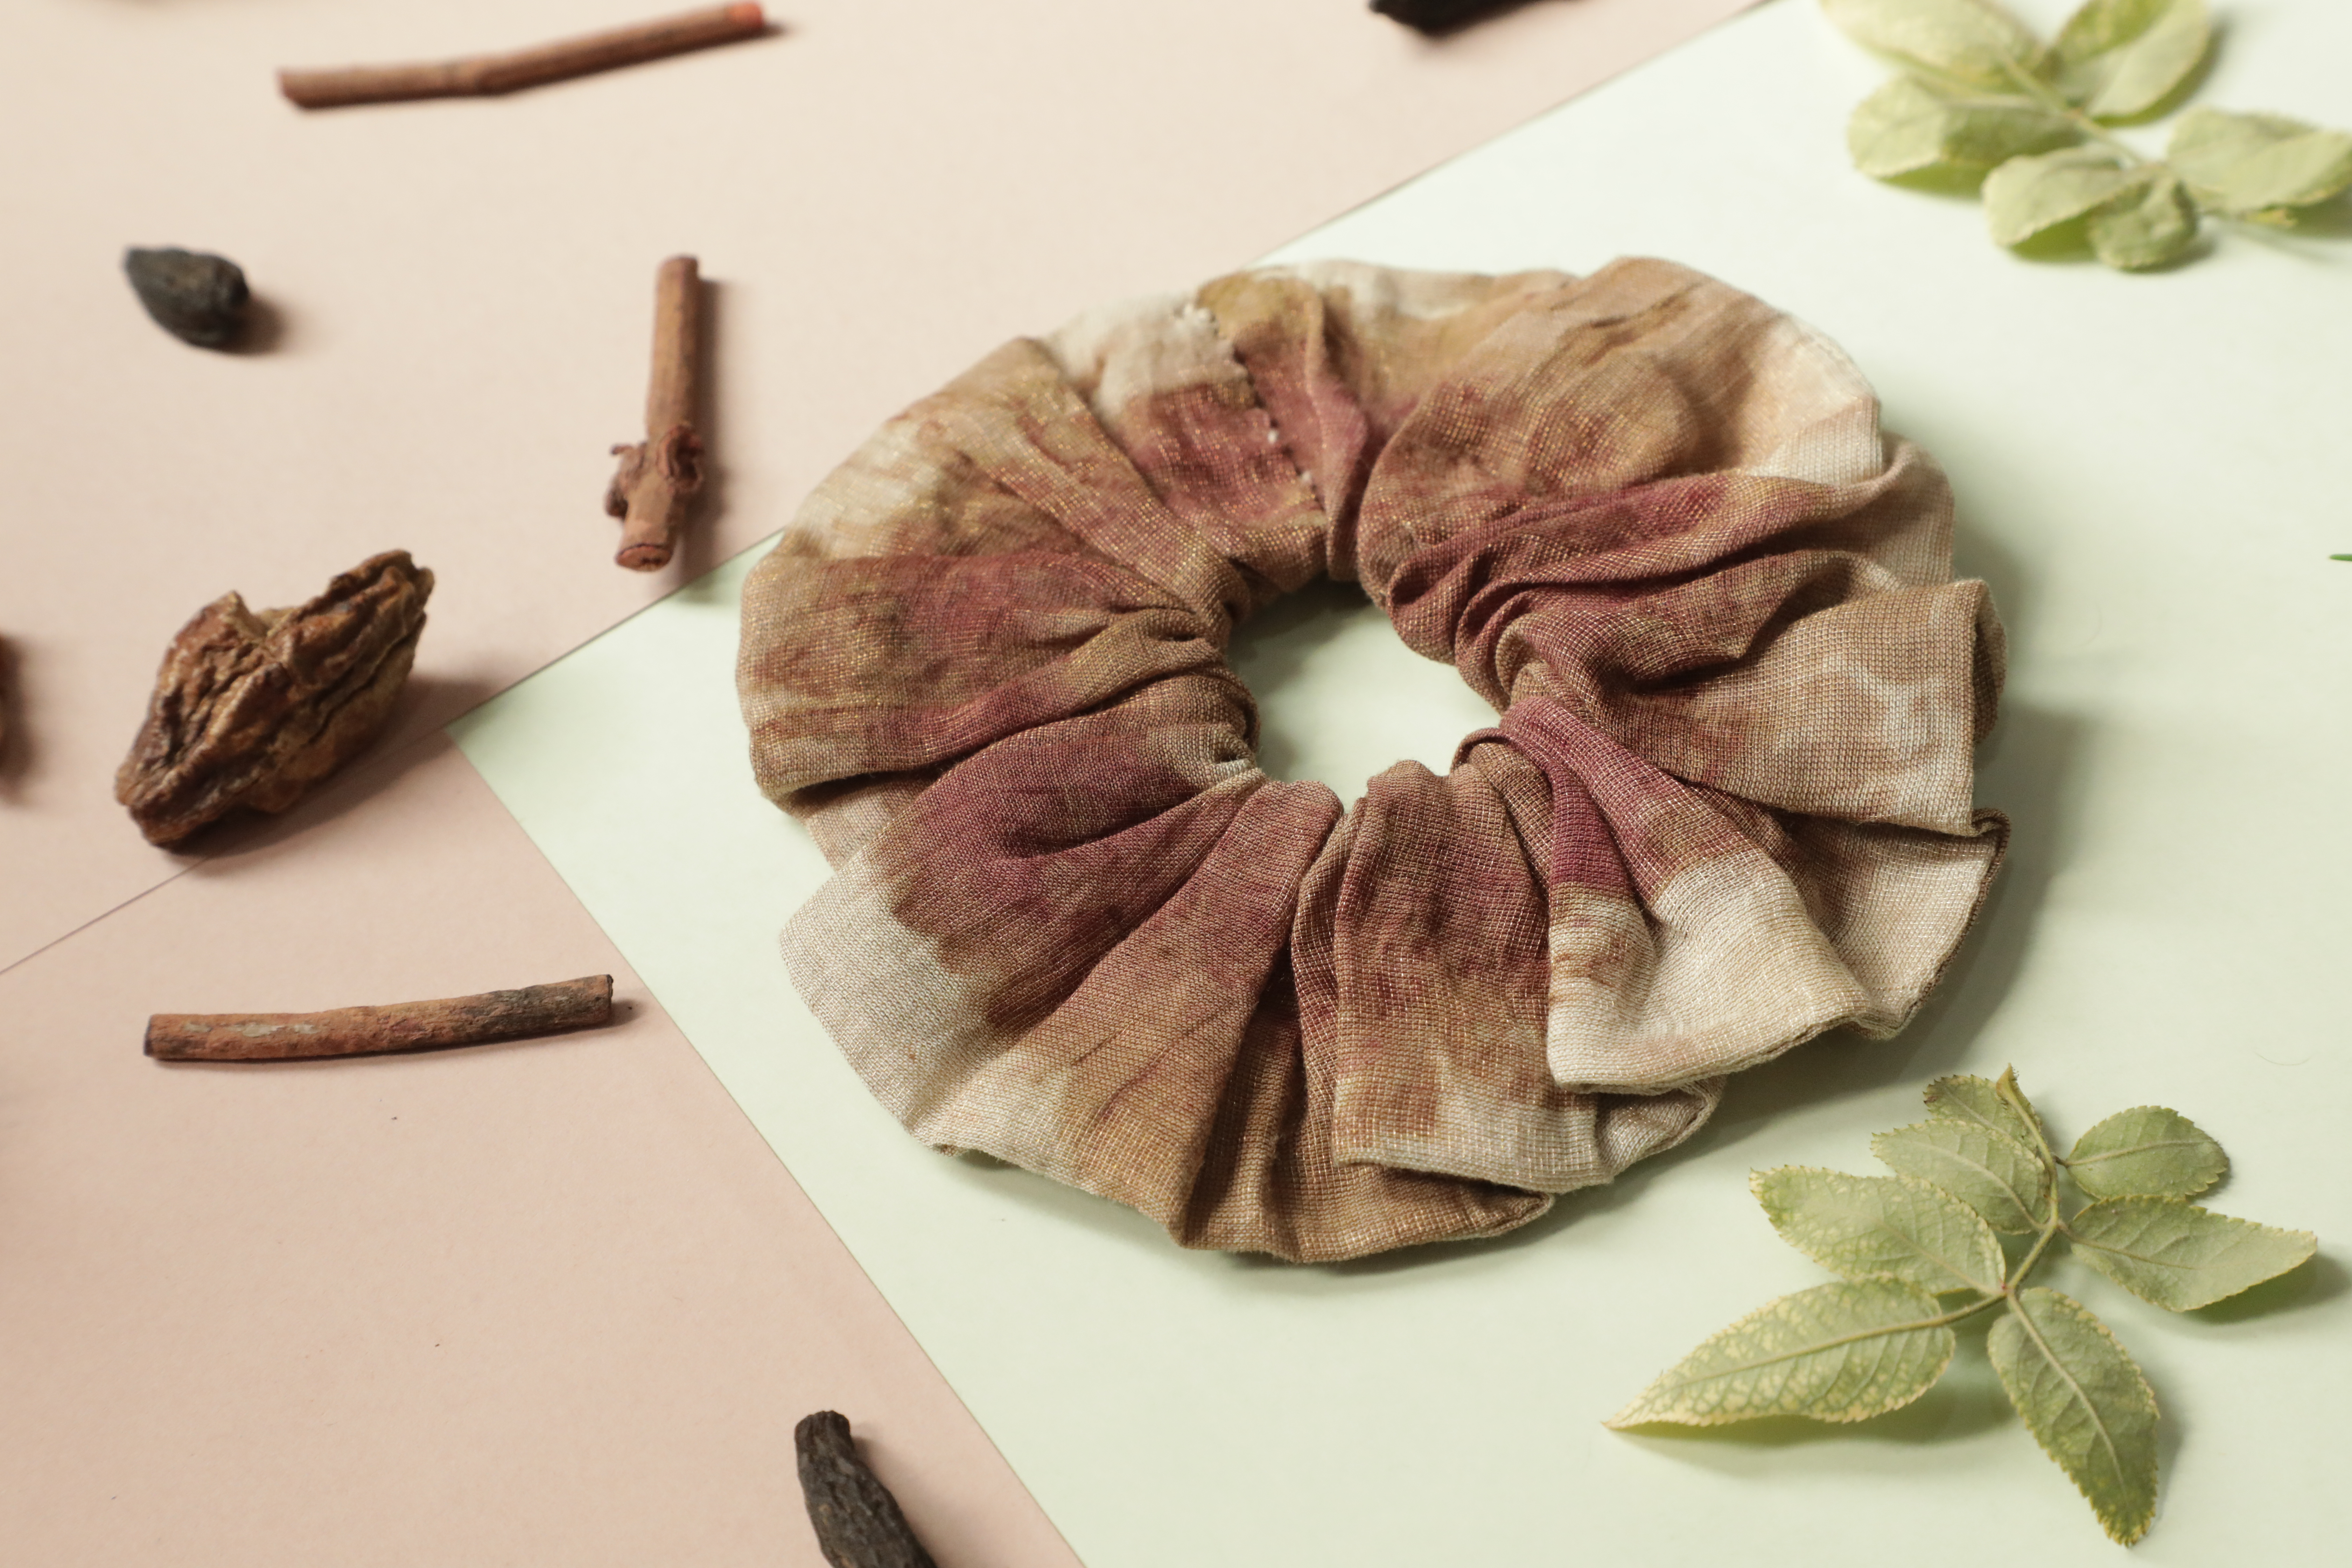 Ayur Herb Upcycled Scrunchies